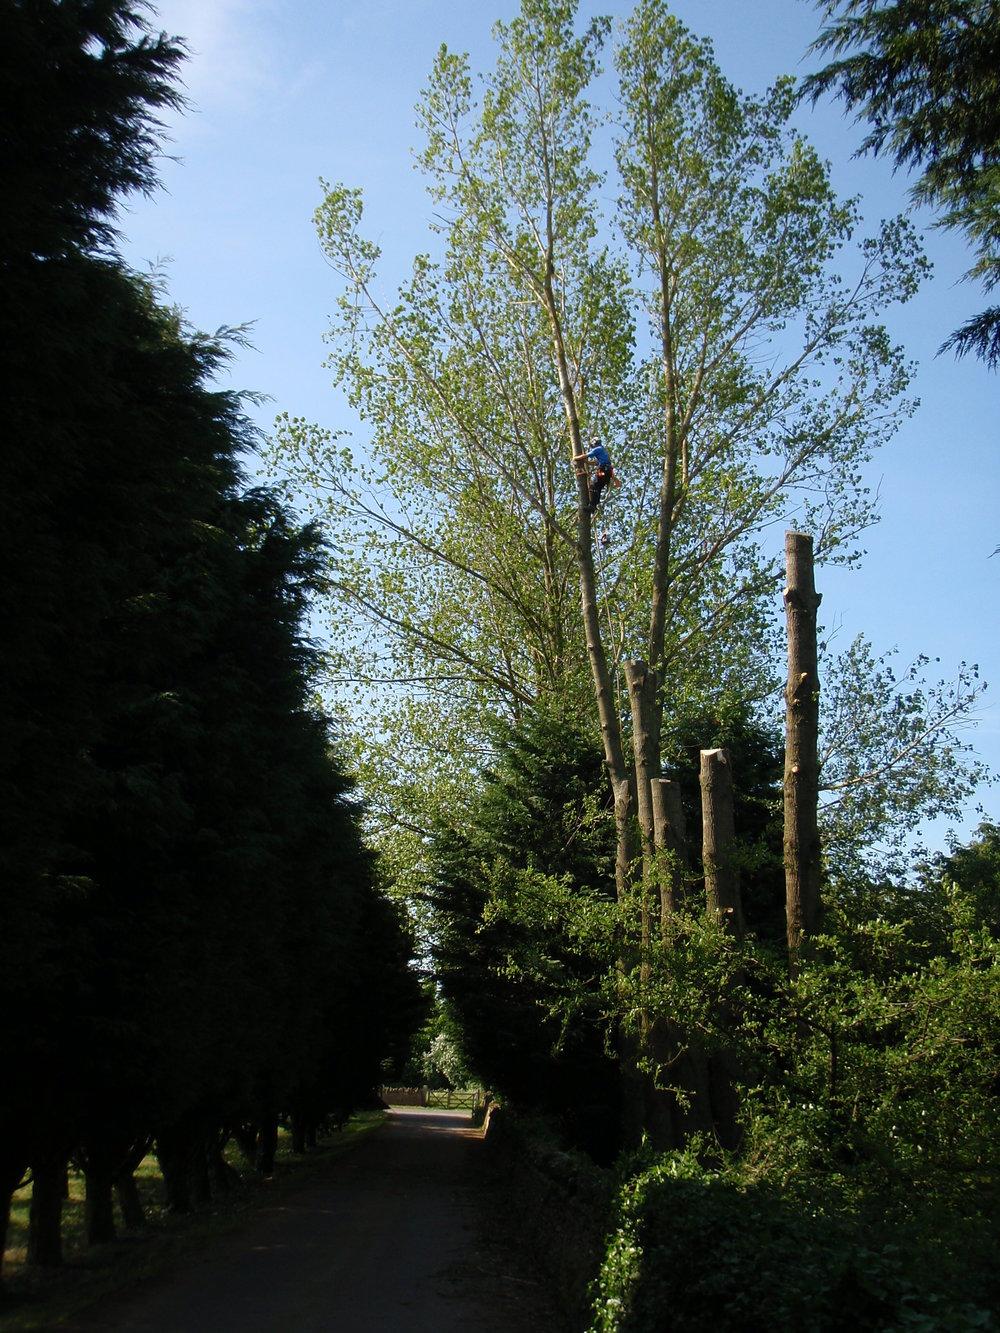 Poplar dismantling - Lavender Hill, Naunton, Gloucestershire